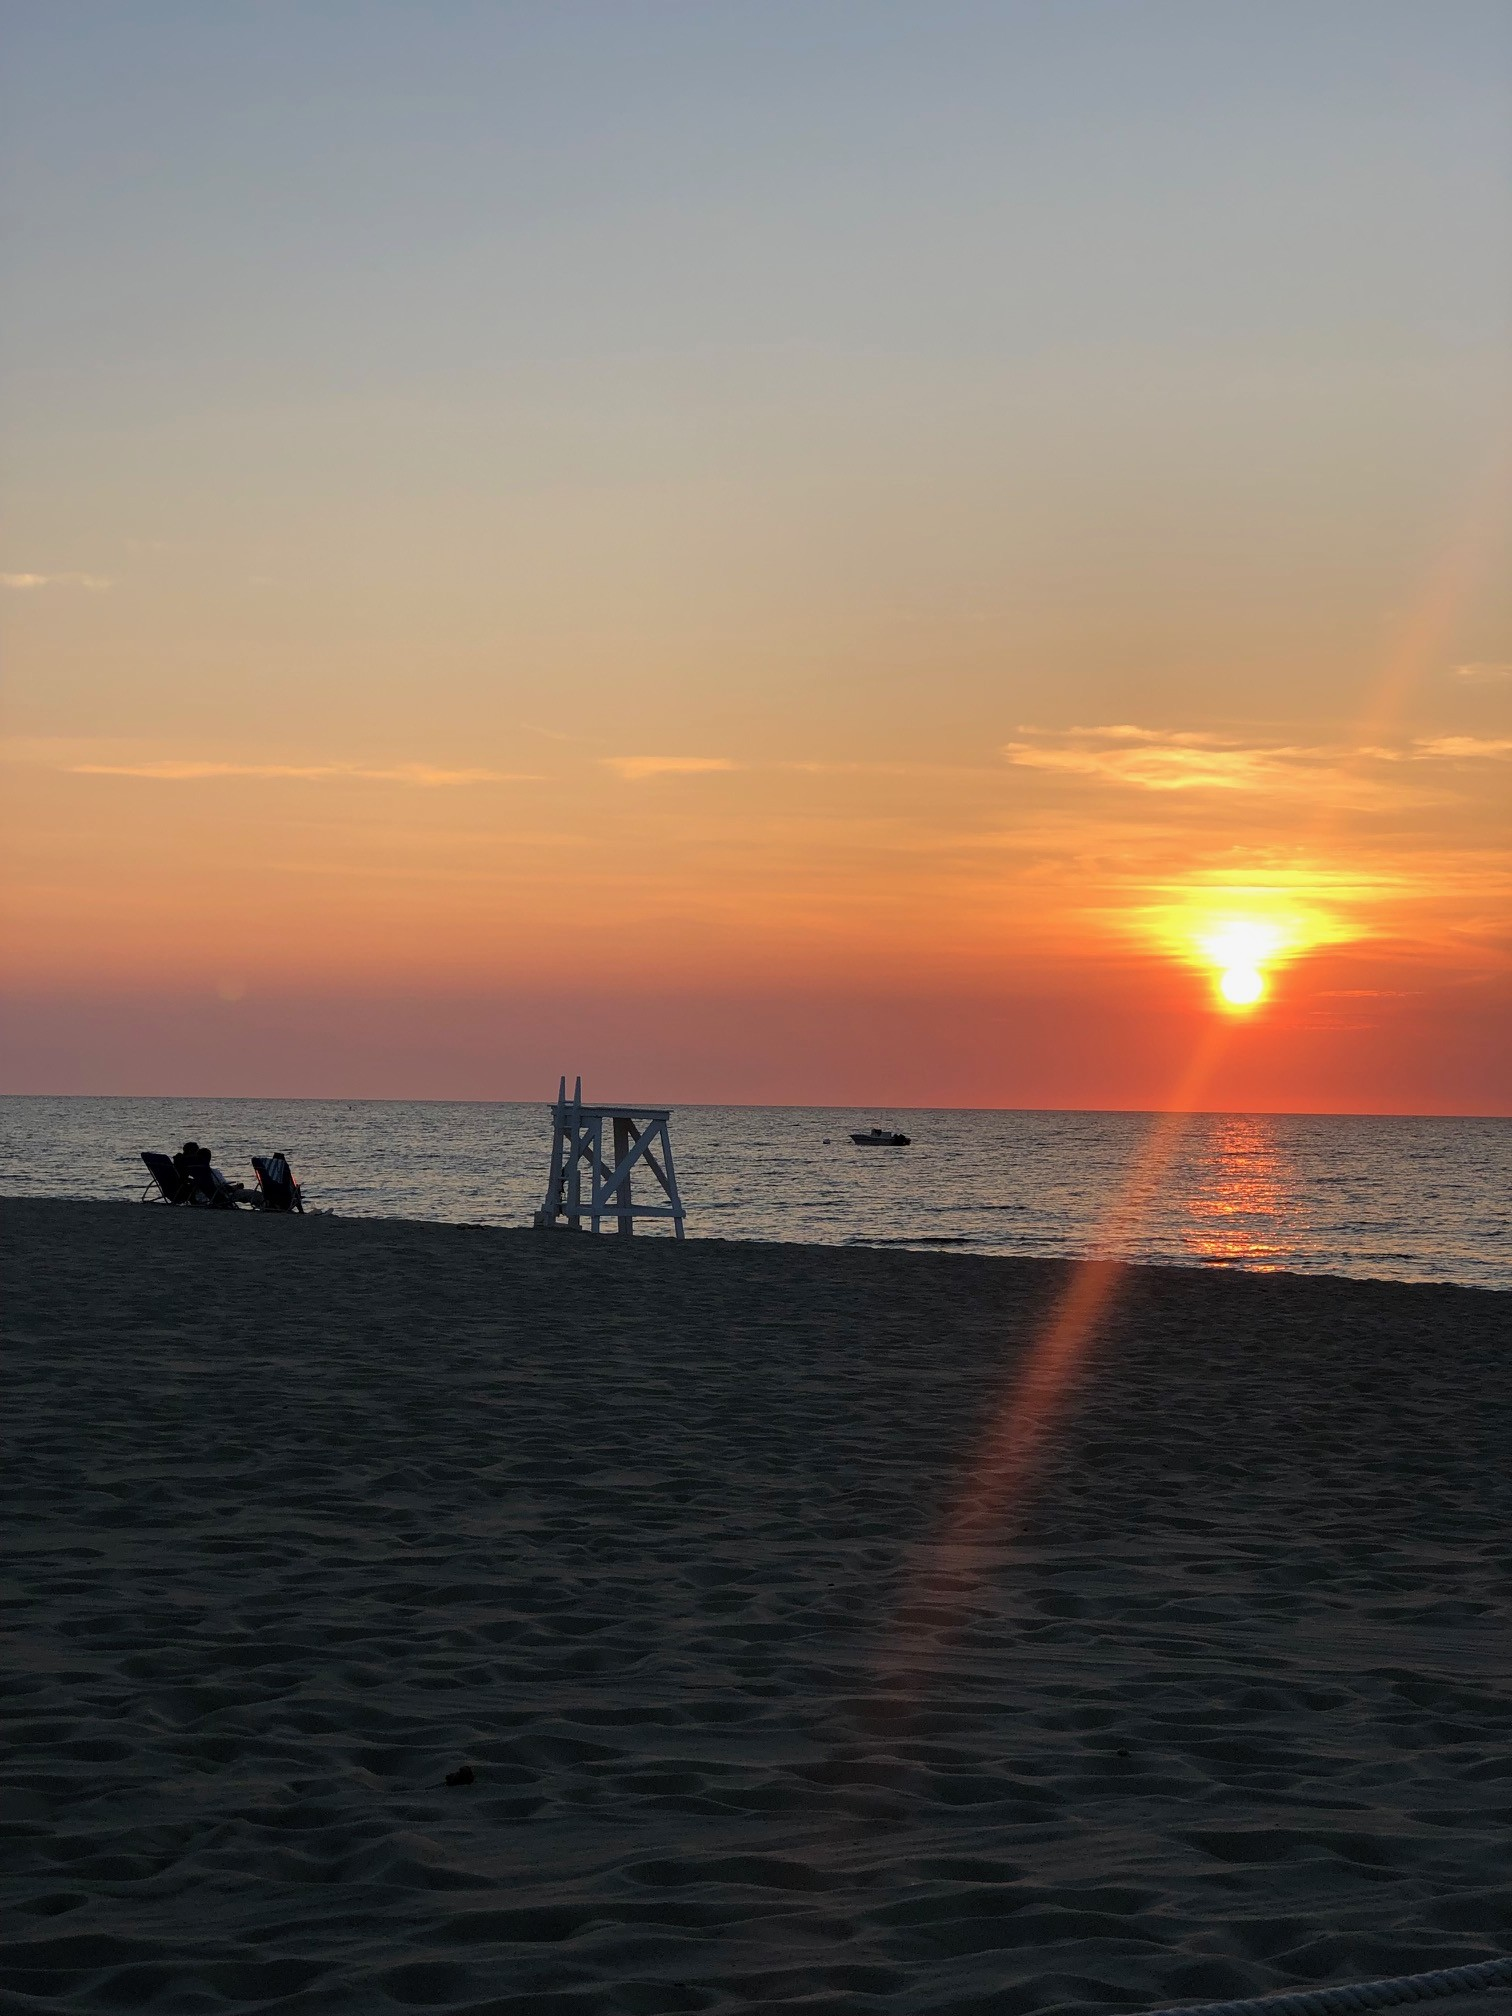 galley beach nantucket, the-alyst.com